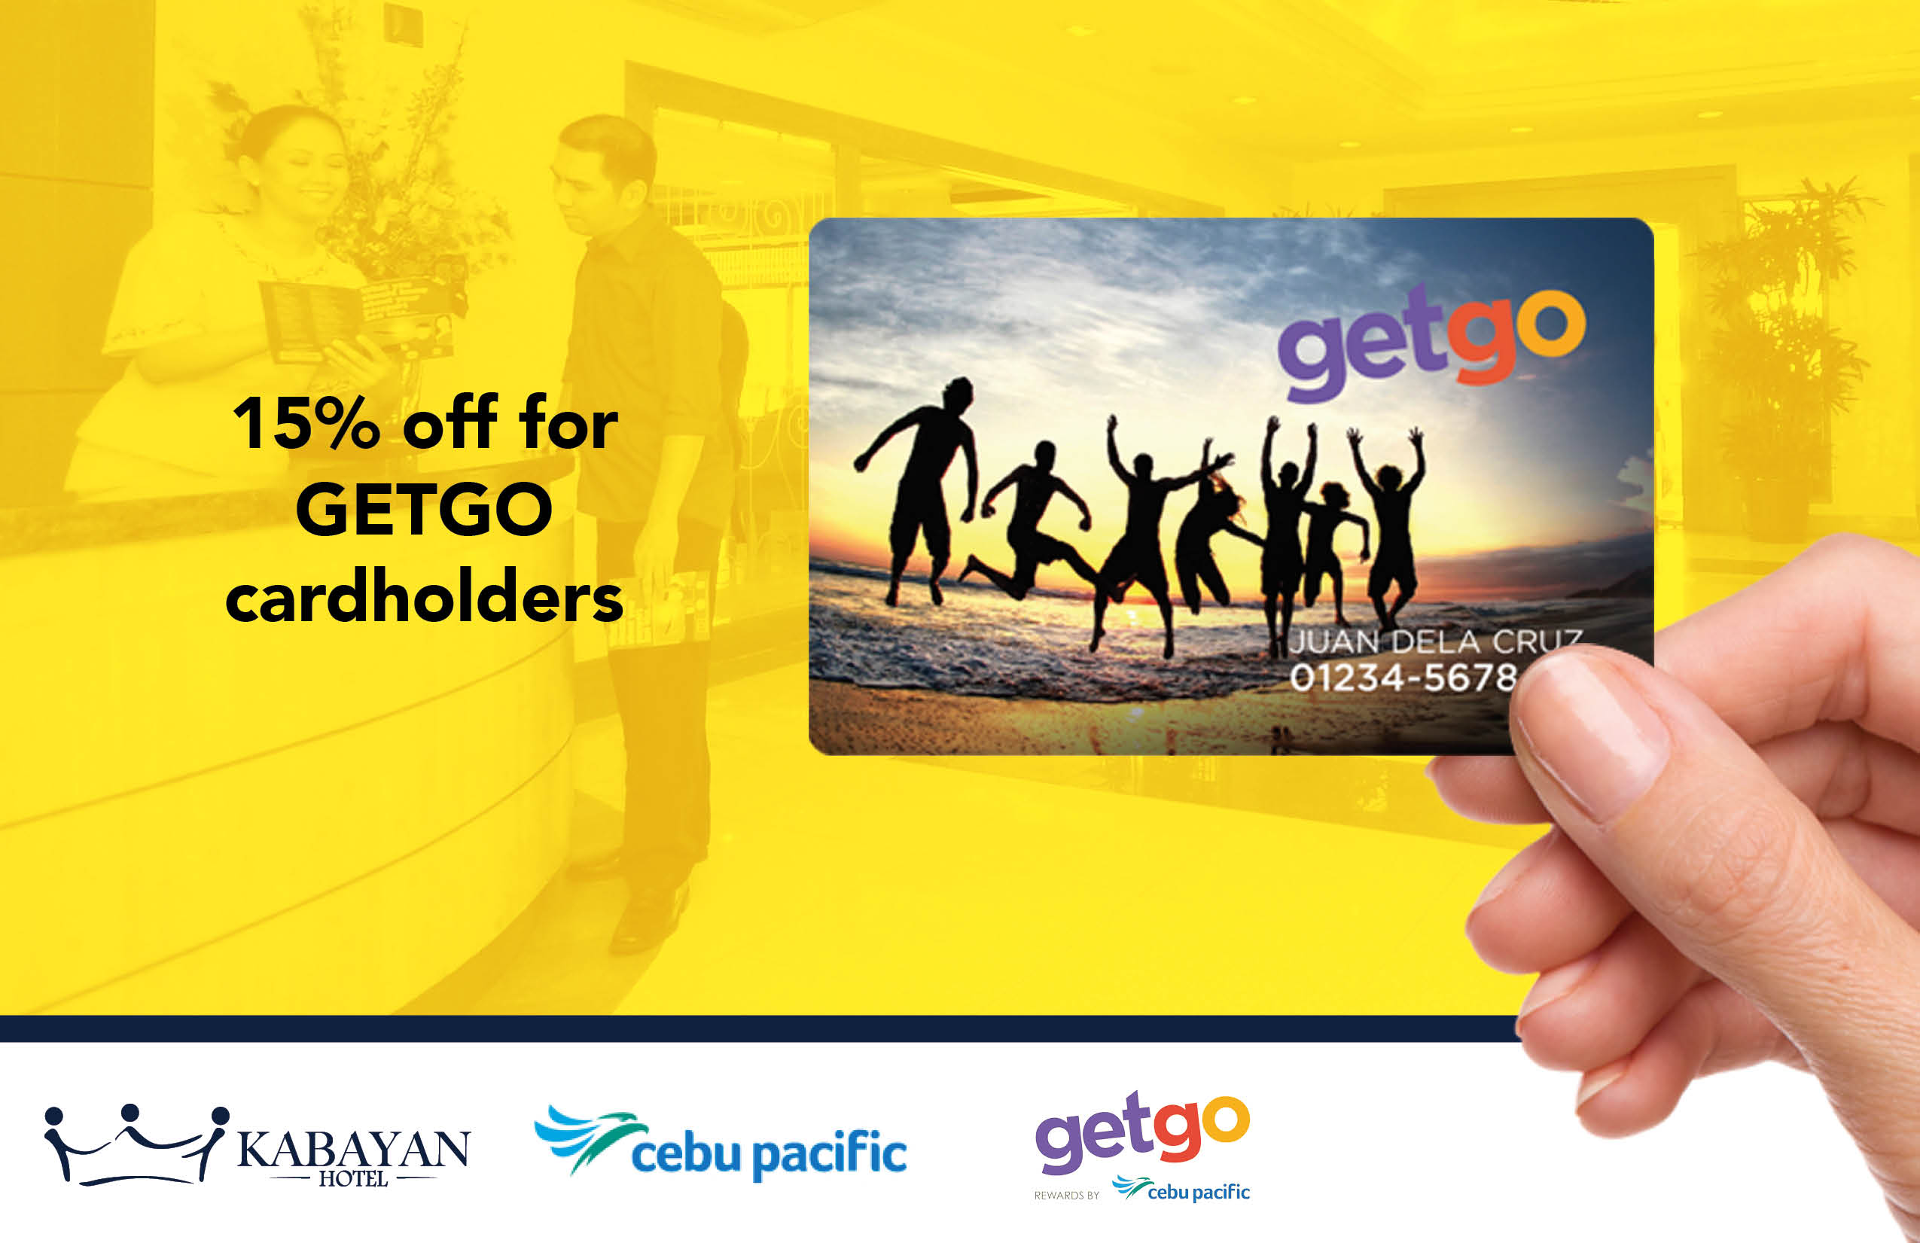 Cebu Pacific GETGO Discount